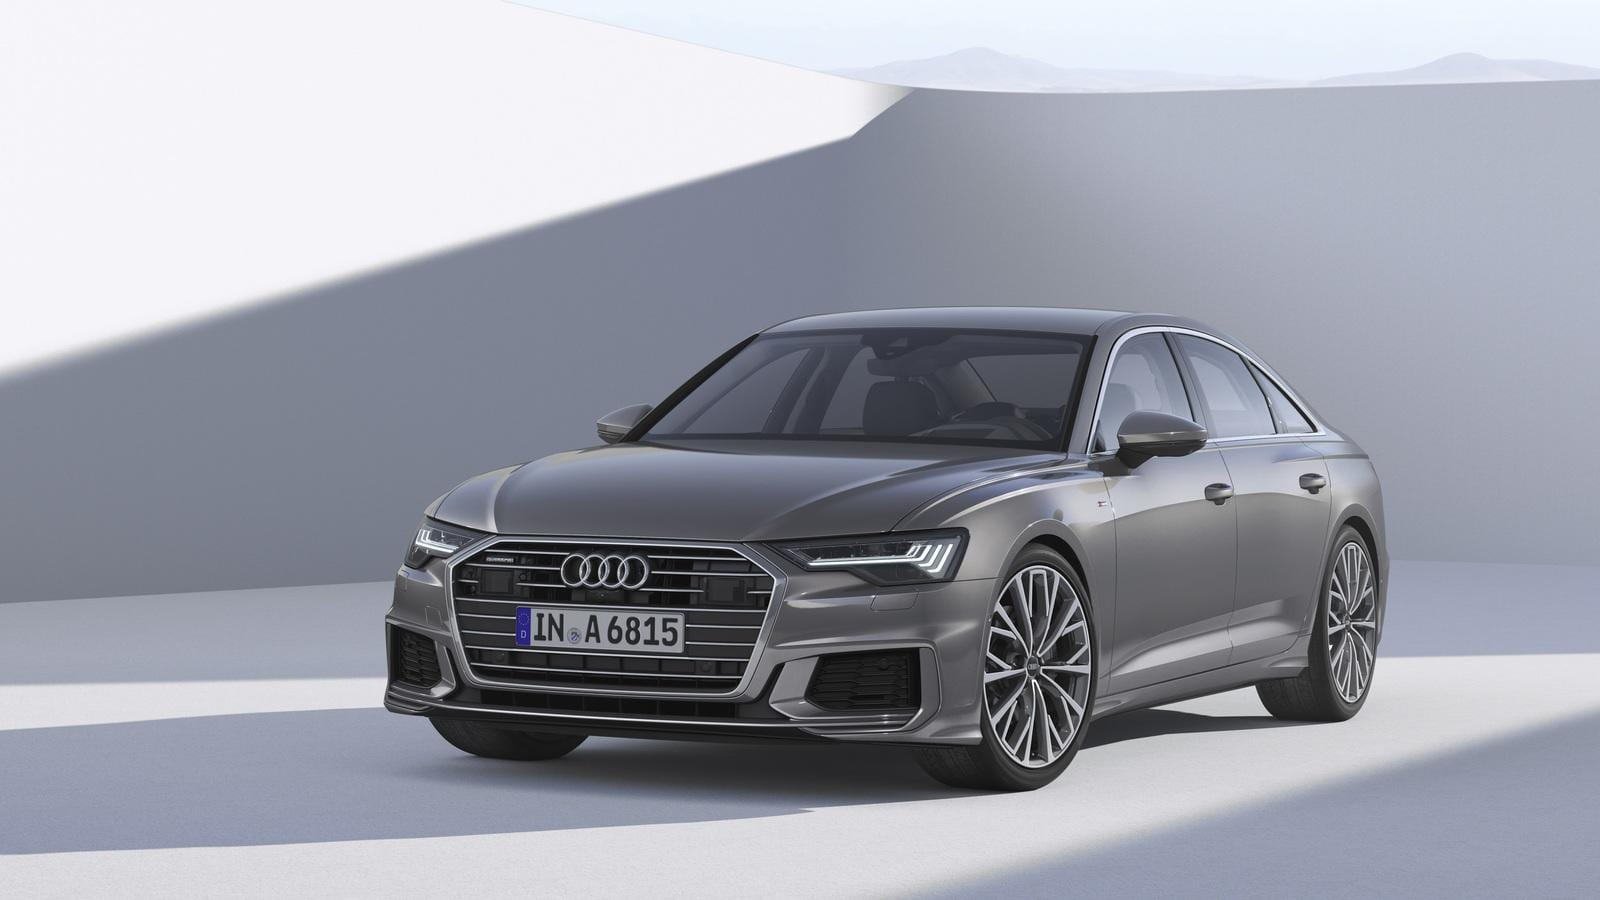 Kekurangan Audi A6 2018 Top Model Tahun Ini